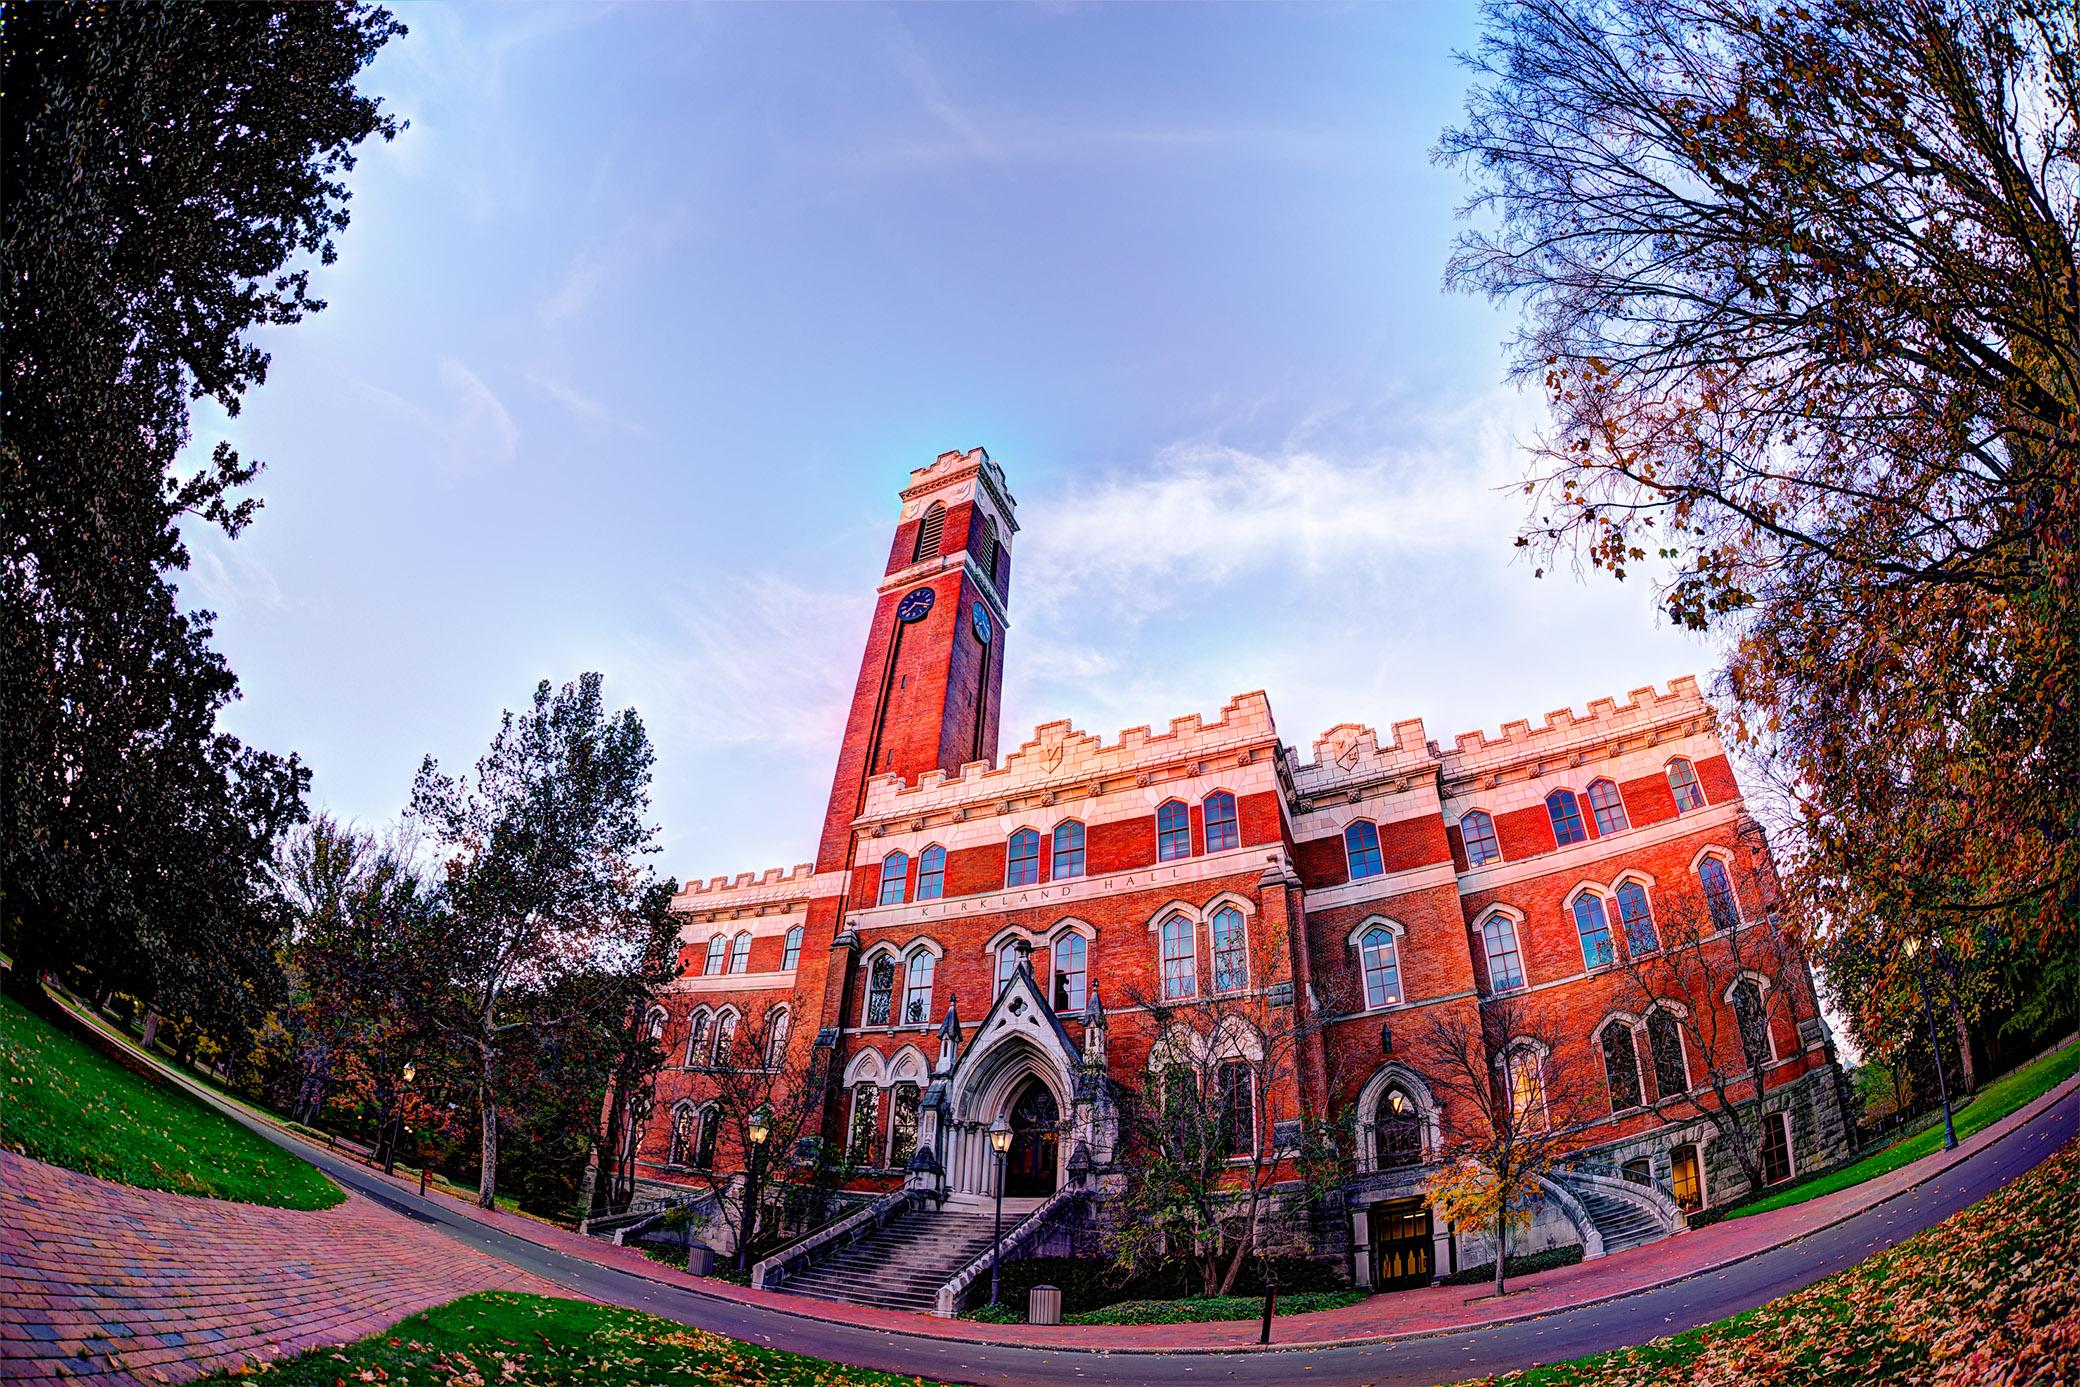 Photo by Robert Wheaton/Vanderbilt University